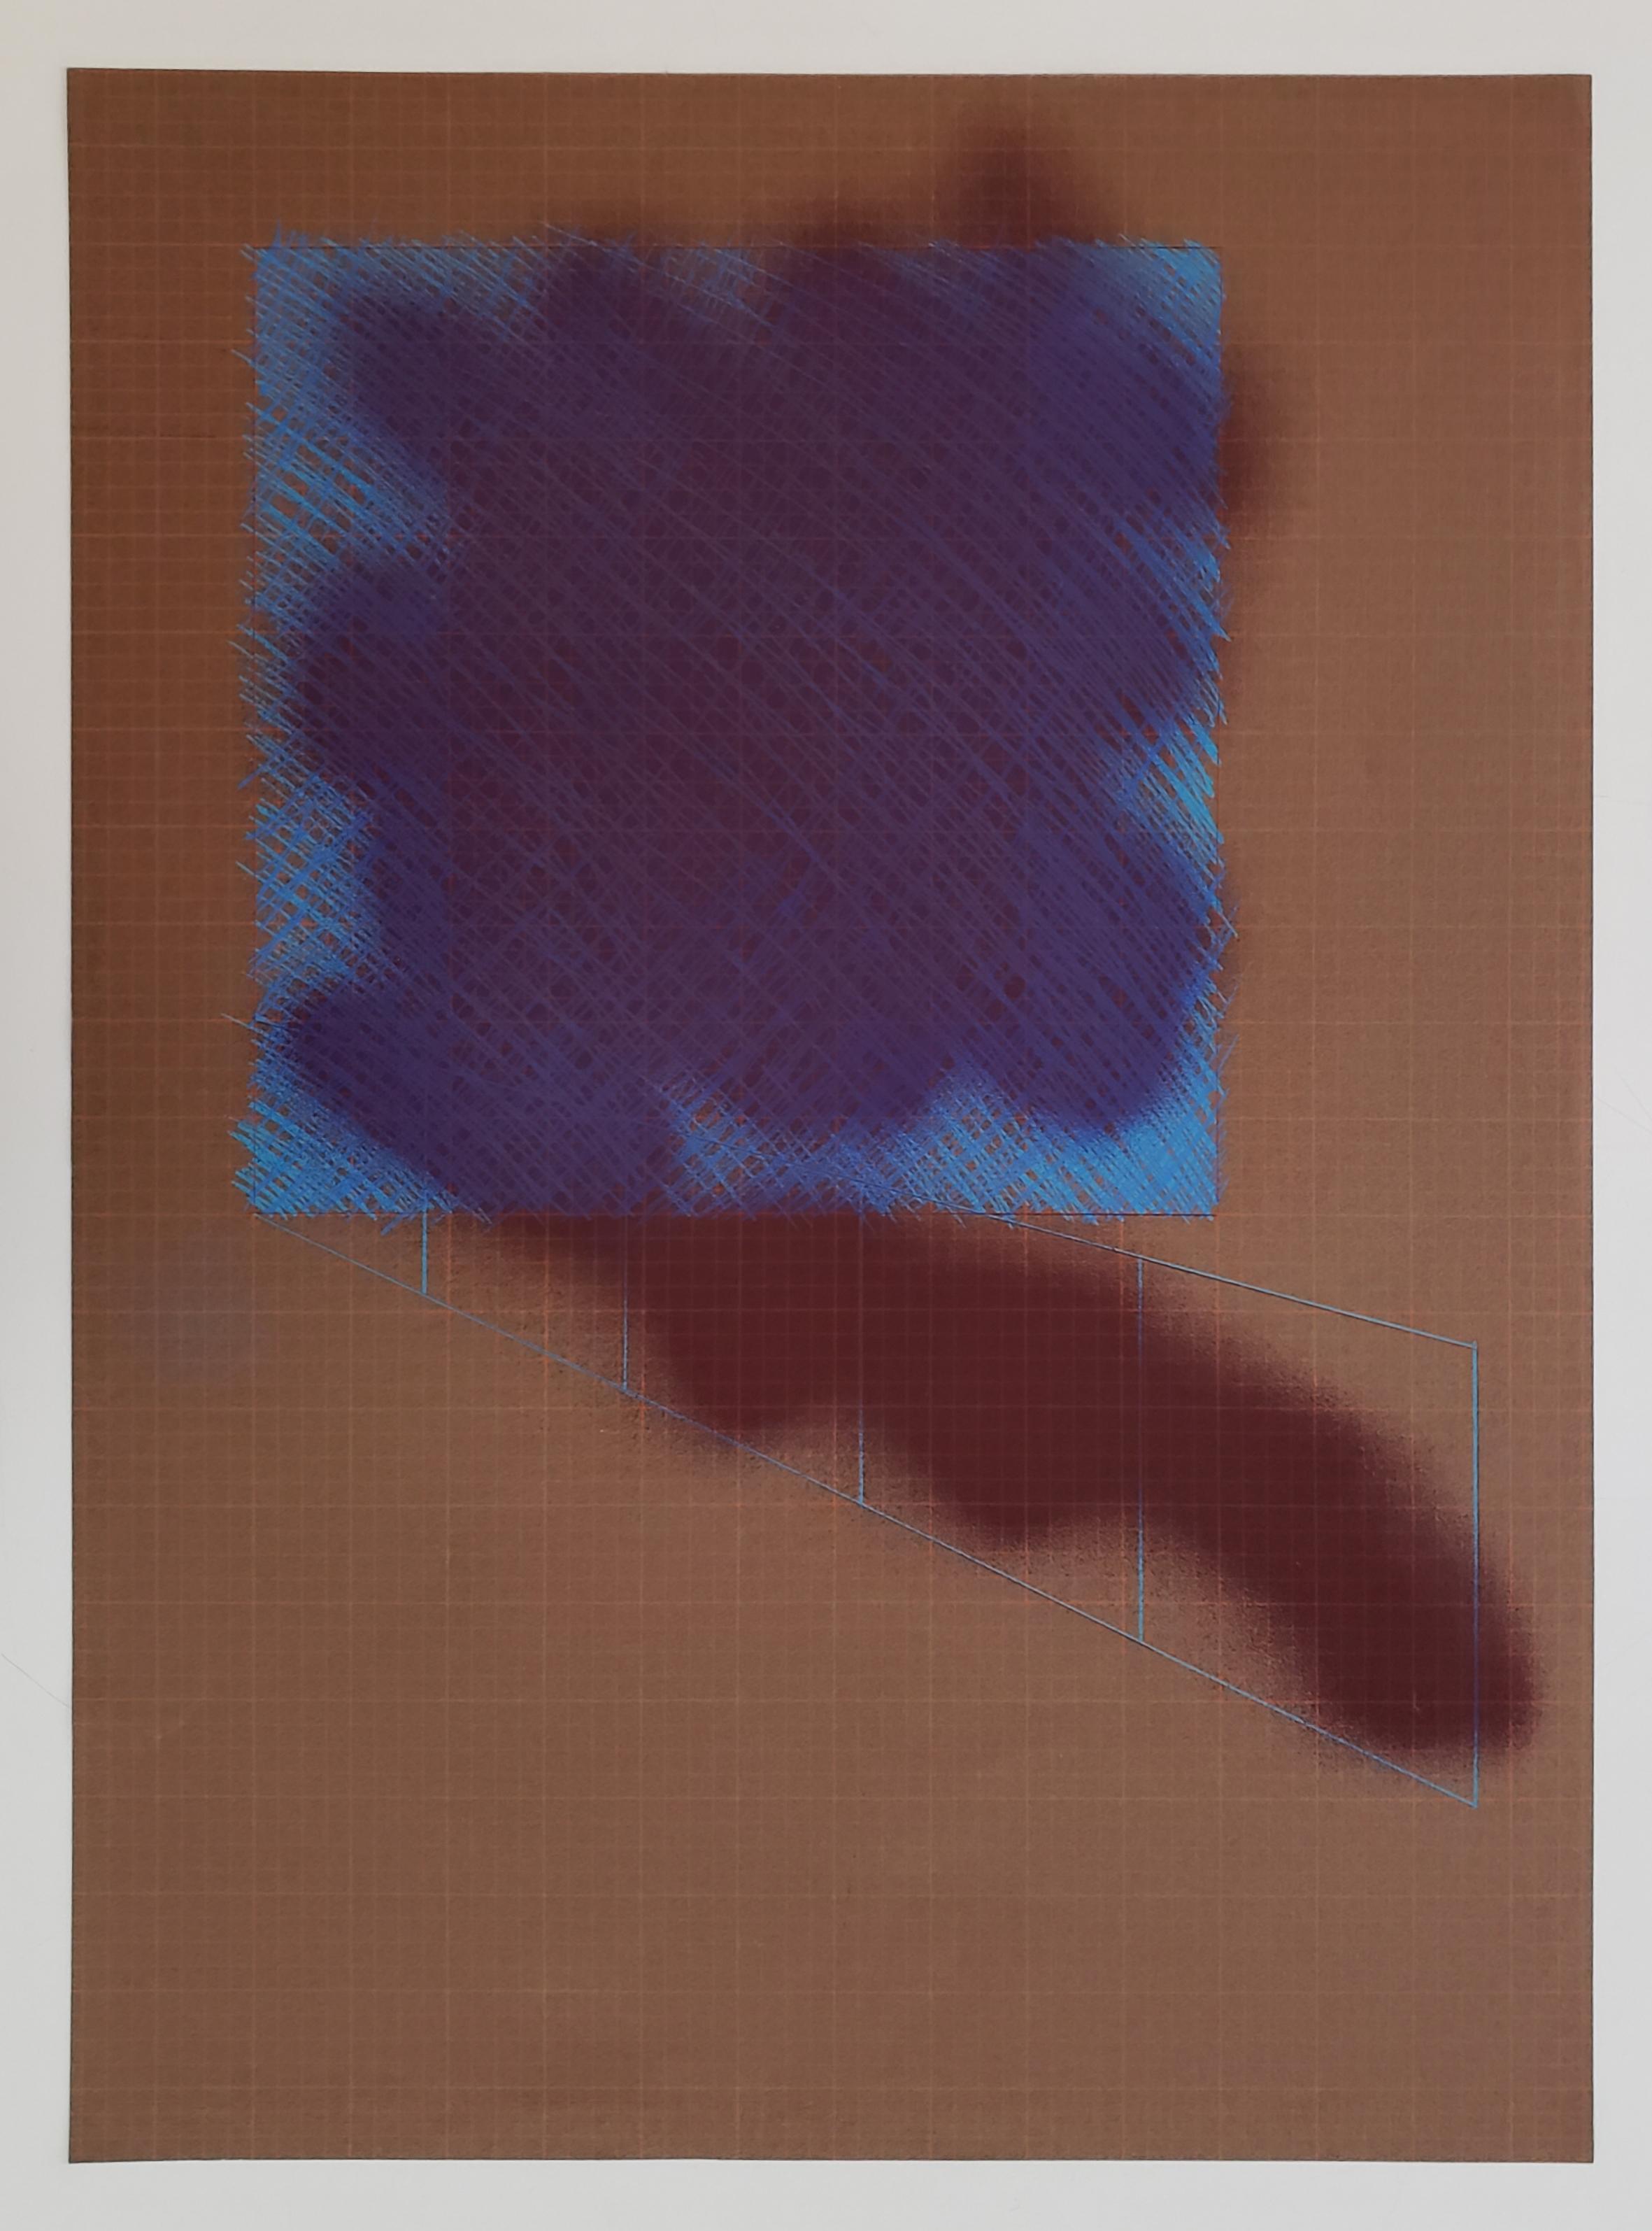 Richard Smith - Abstract Grid